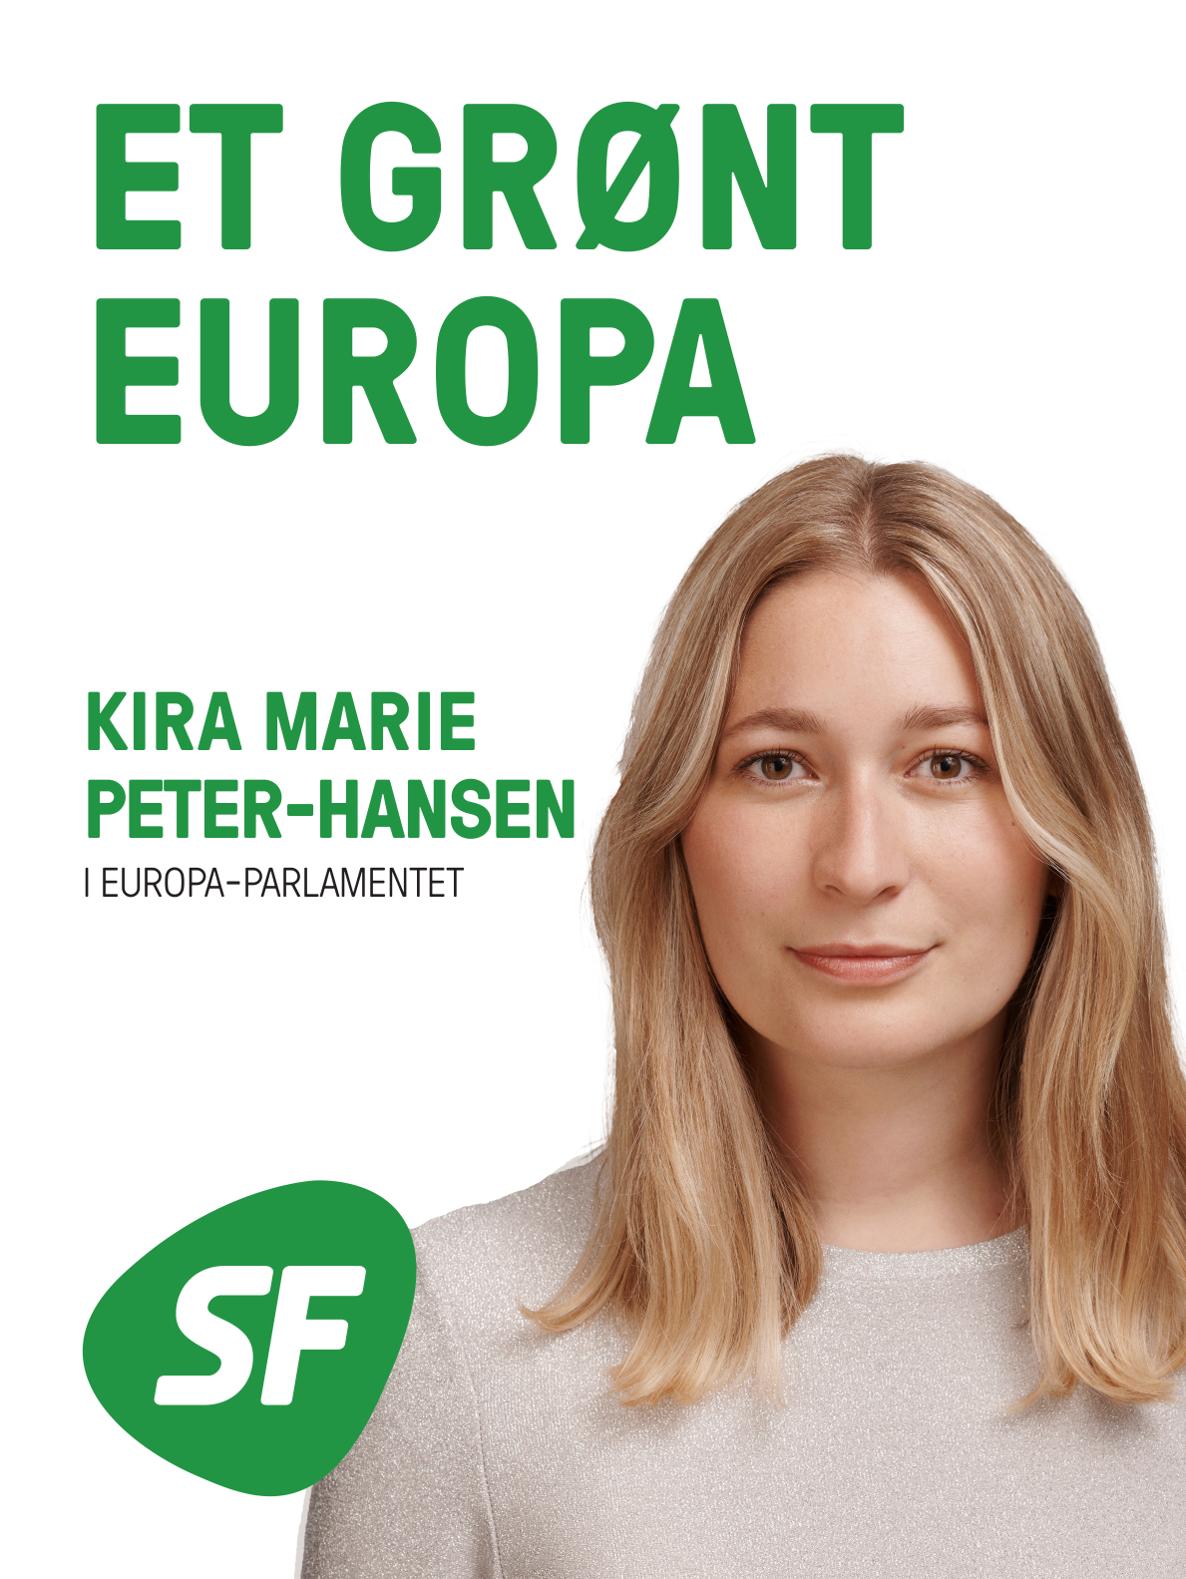 EP-kandidat: Kira Marie Peter-Hansen